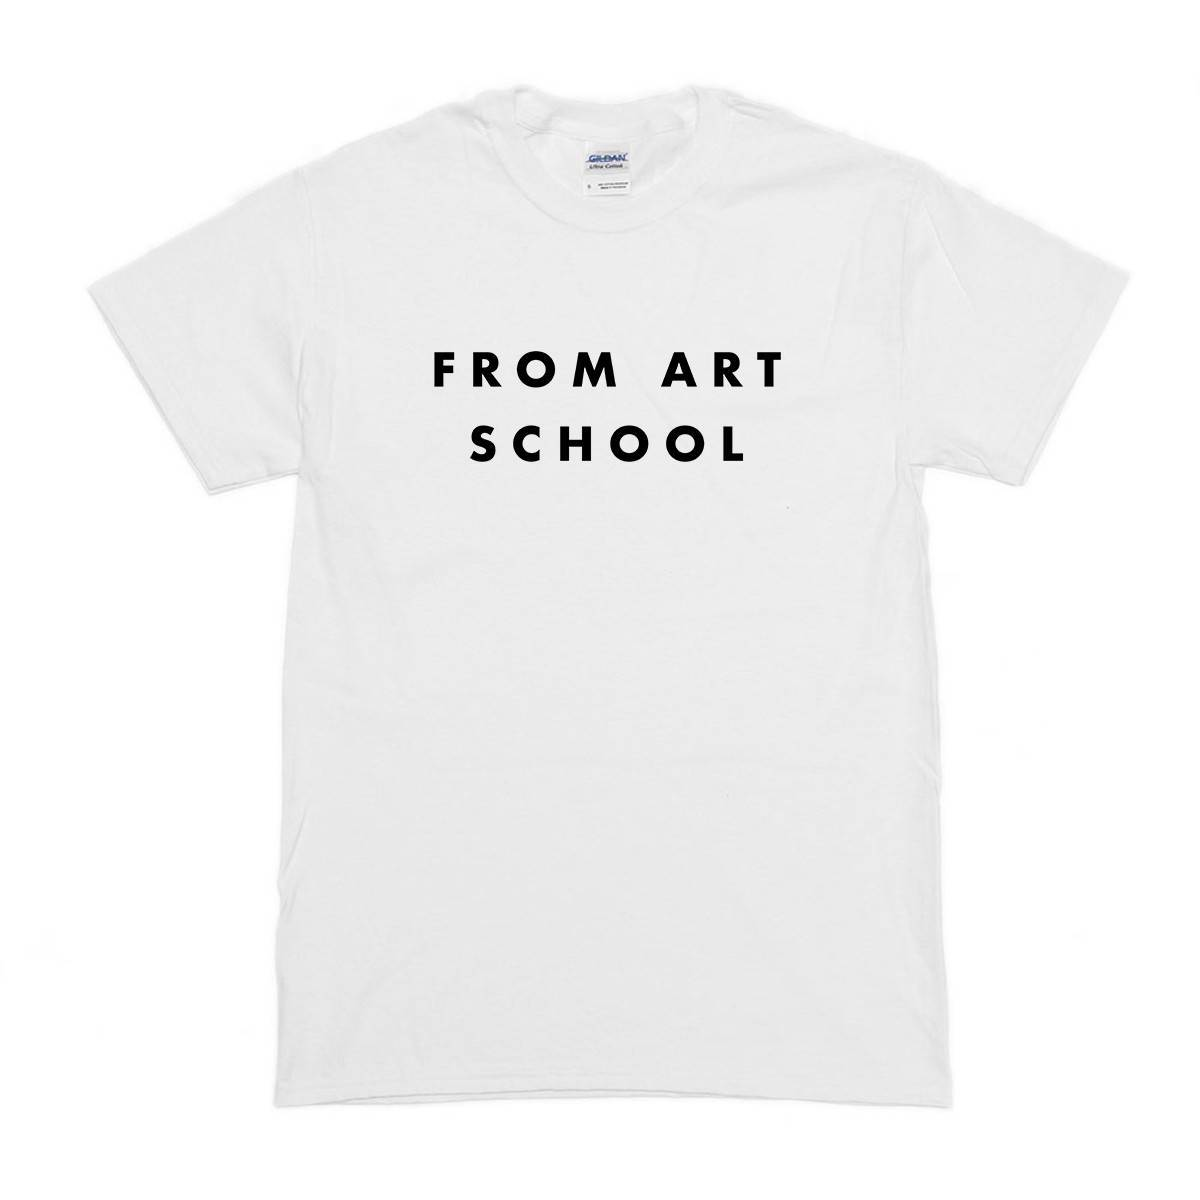 from-art-school-tshirt-2